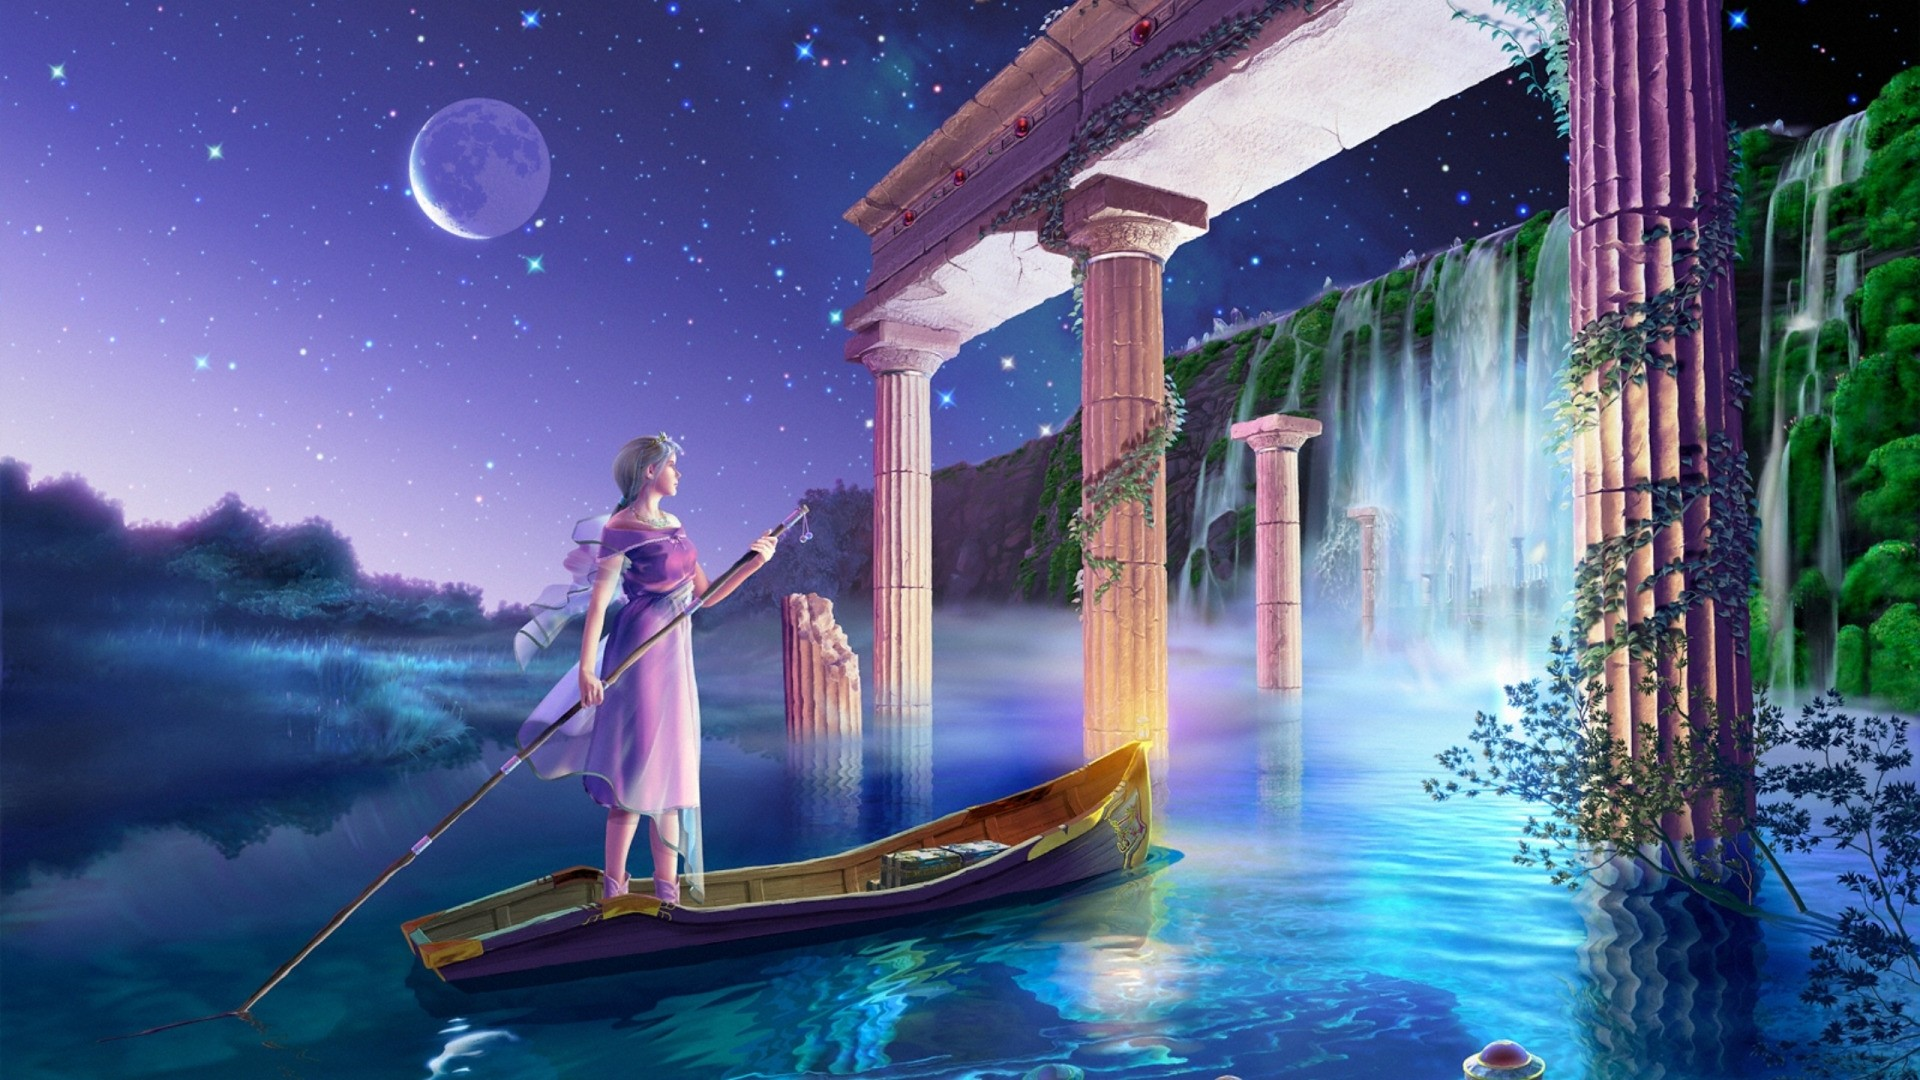 Celestial Desktop Wallpaper